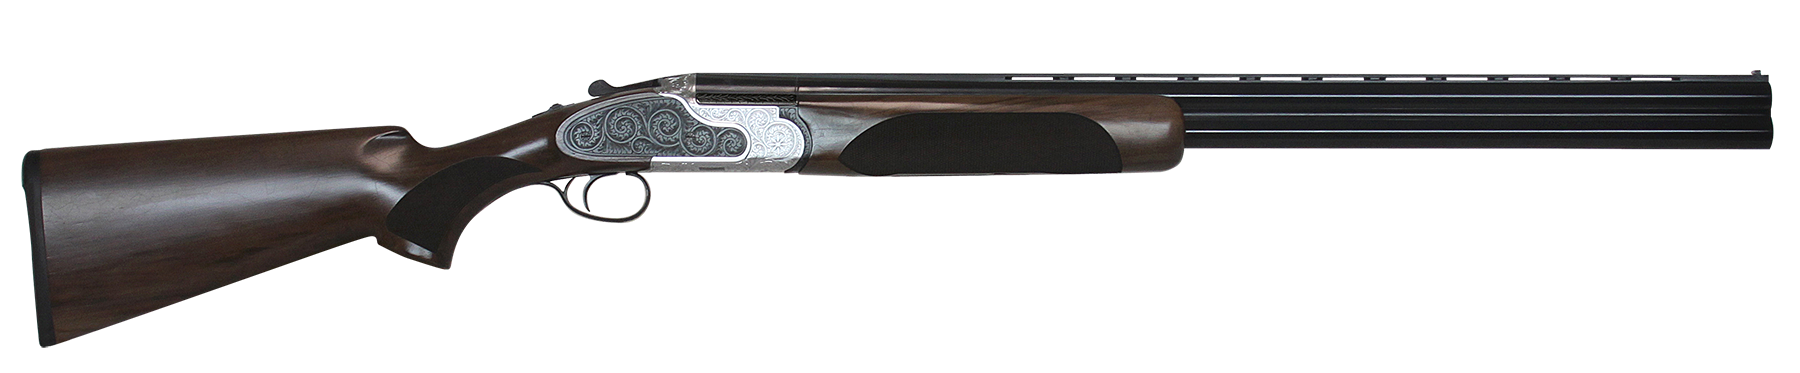 Glock G17 Gen 4 Tac Pack Best Price: $667.99 - Price